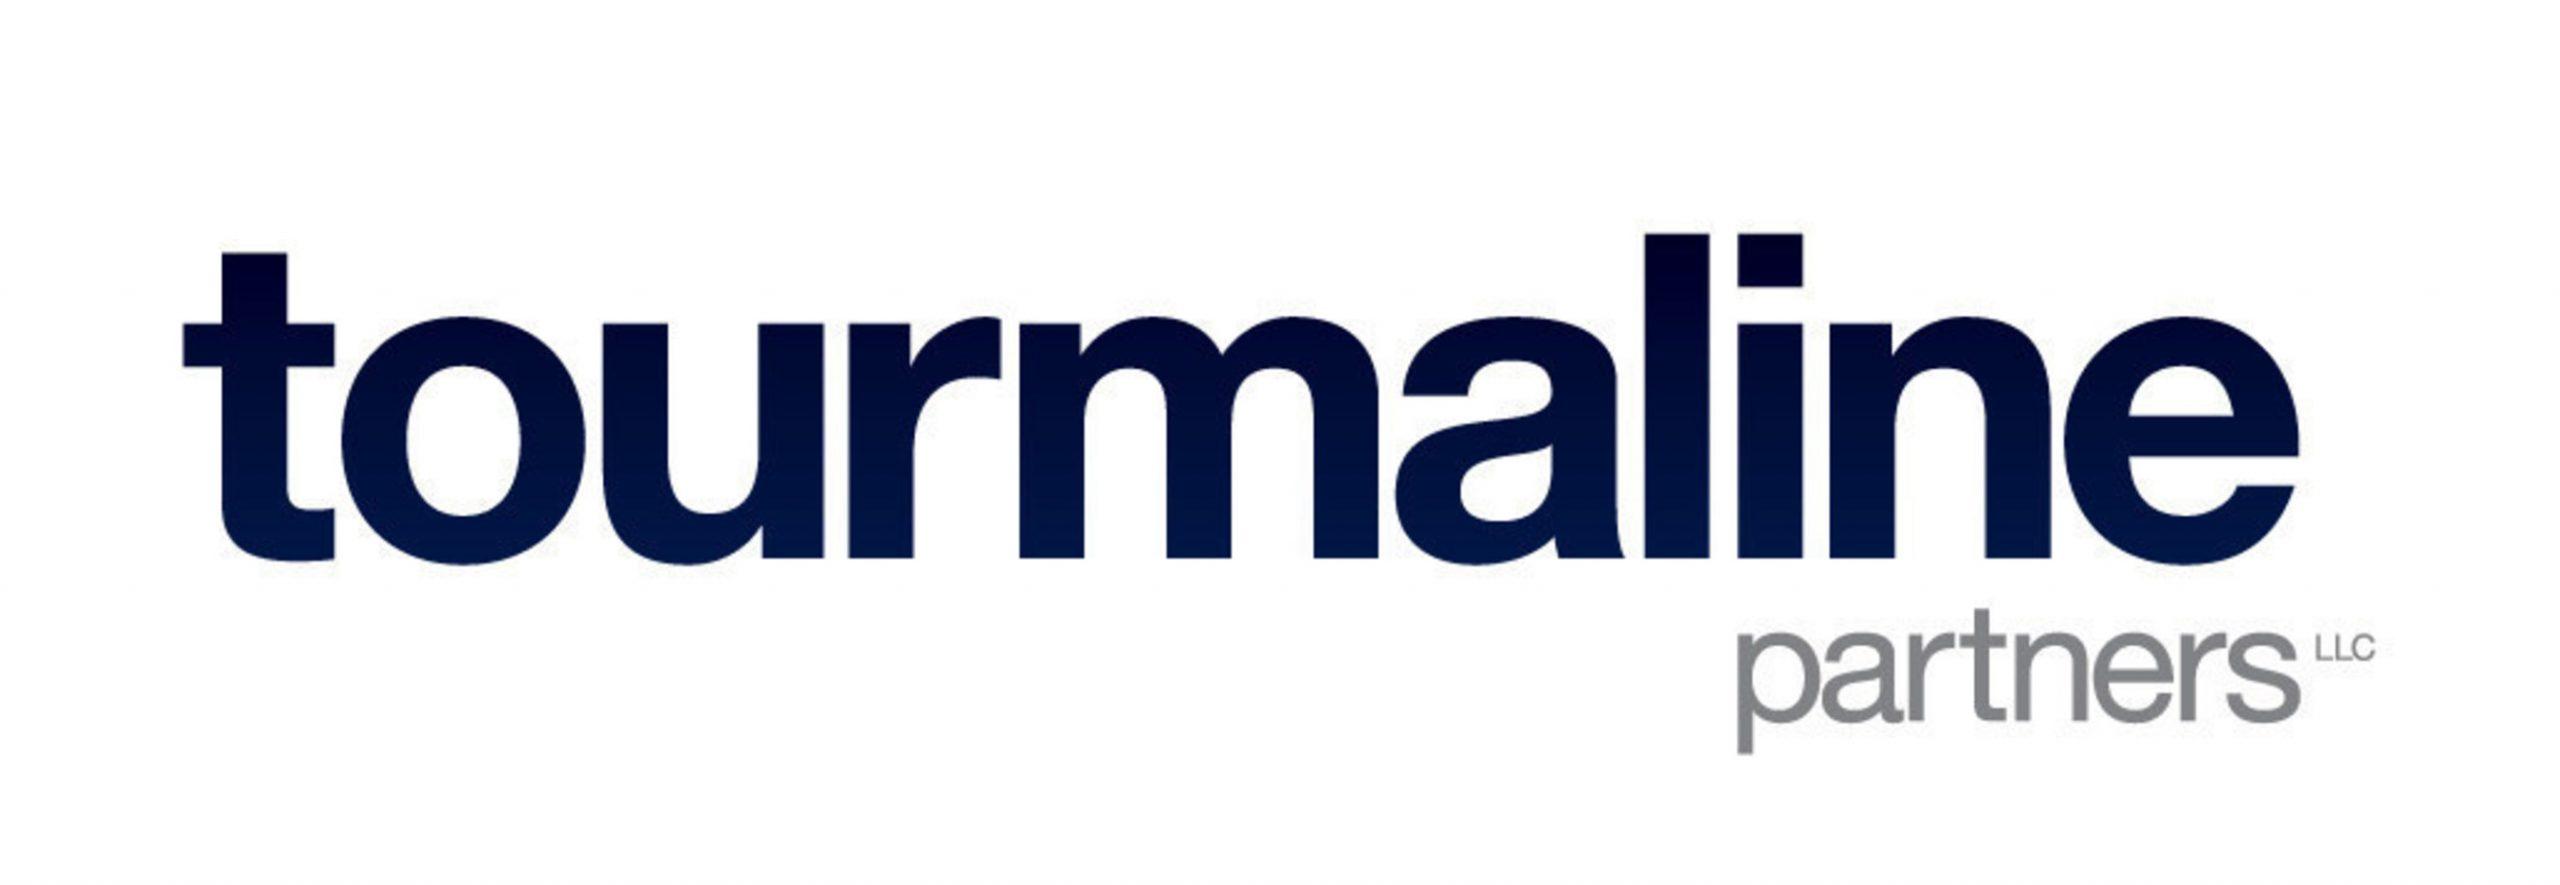 Tourmaline Partners Celebrates 10th Anniversary